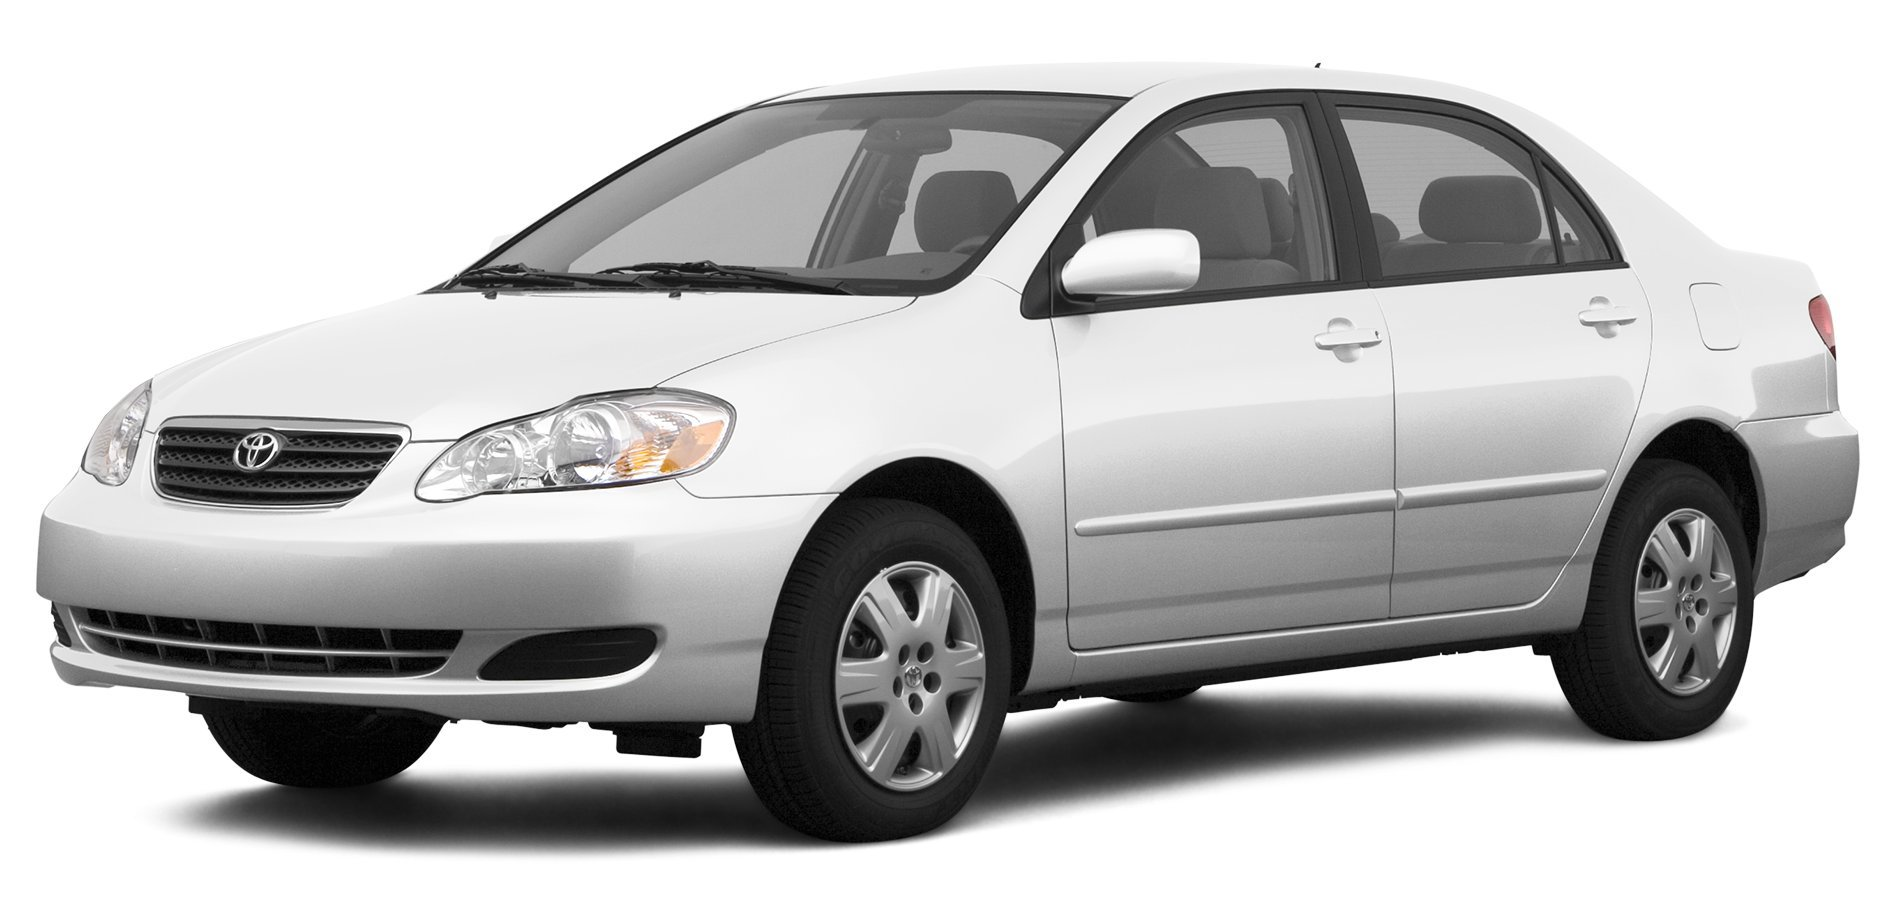 White Toyota Corolla >> Amazon Com 2008 Toyota Corolla Reviews Images And Specs